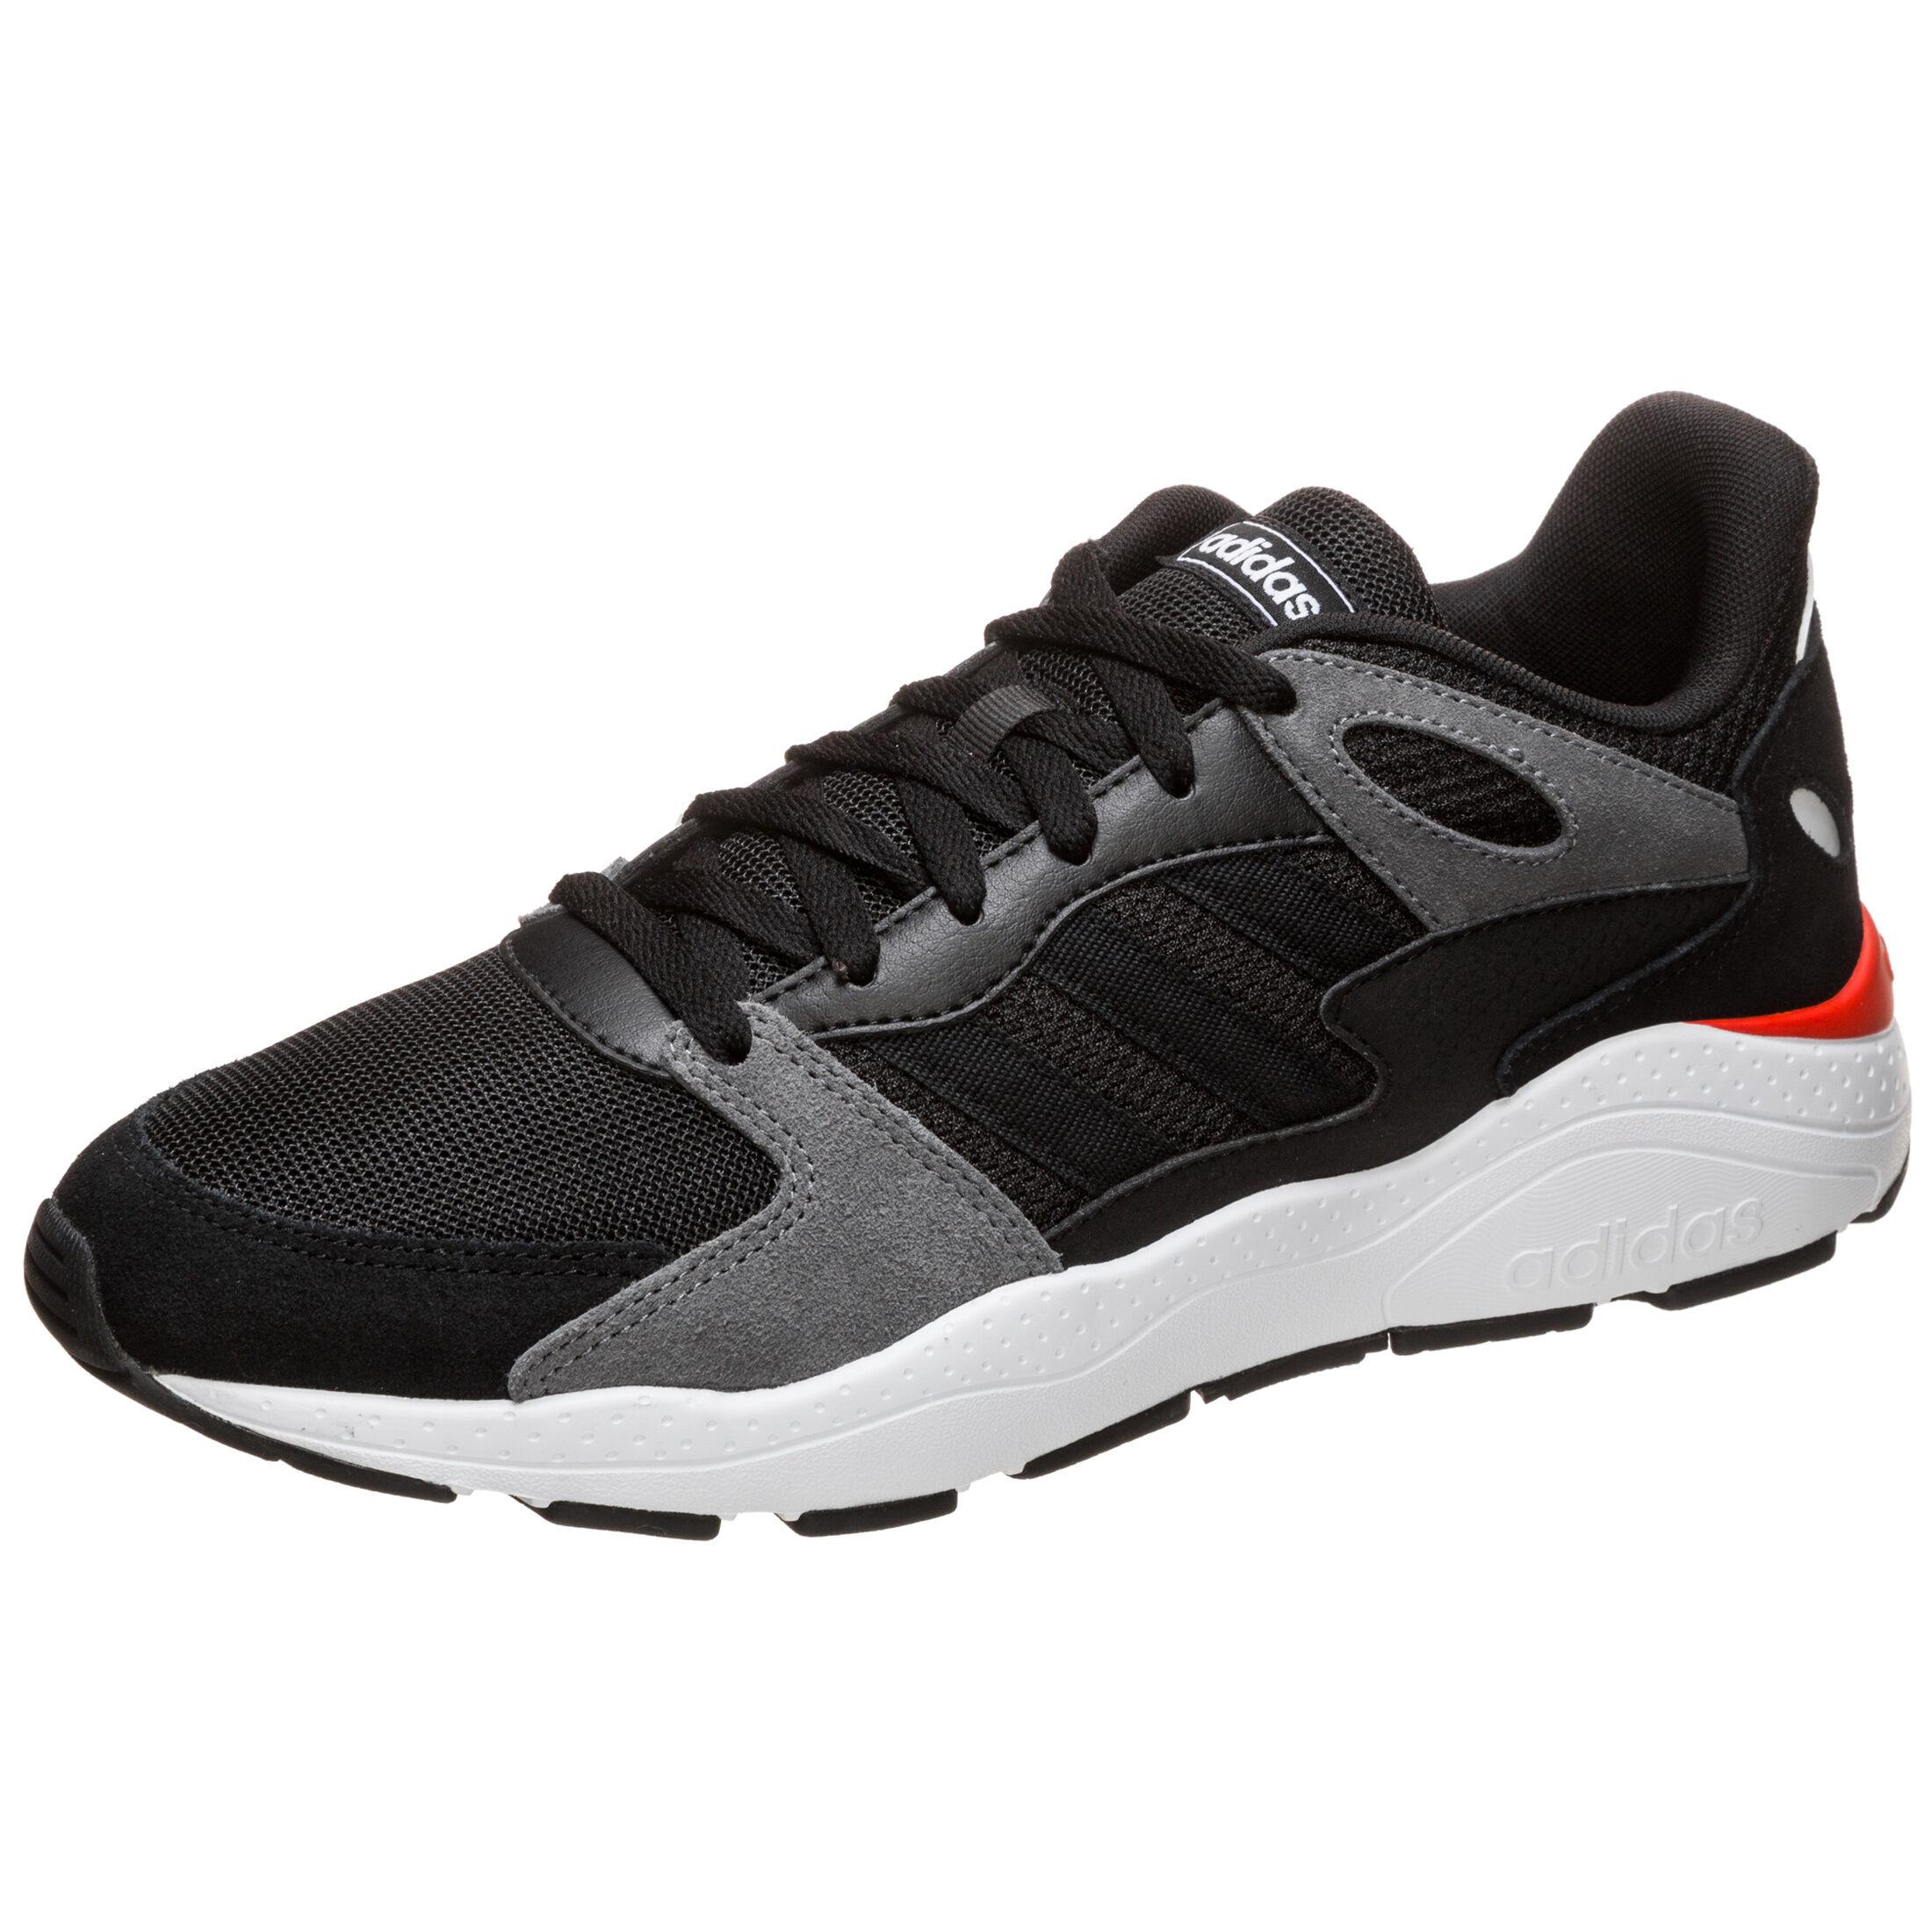 Crazychaos Sneaker Adidas Outfitter Herren Bei 67vfYbgy